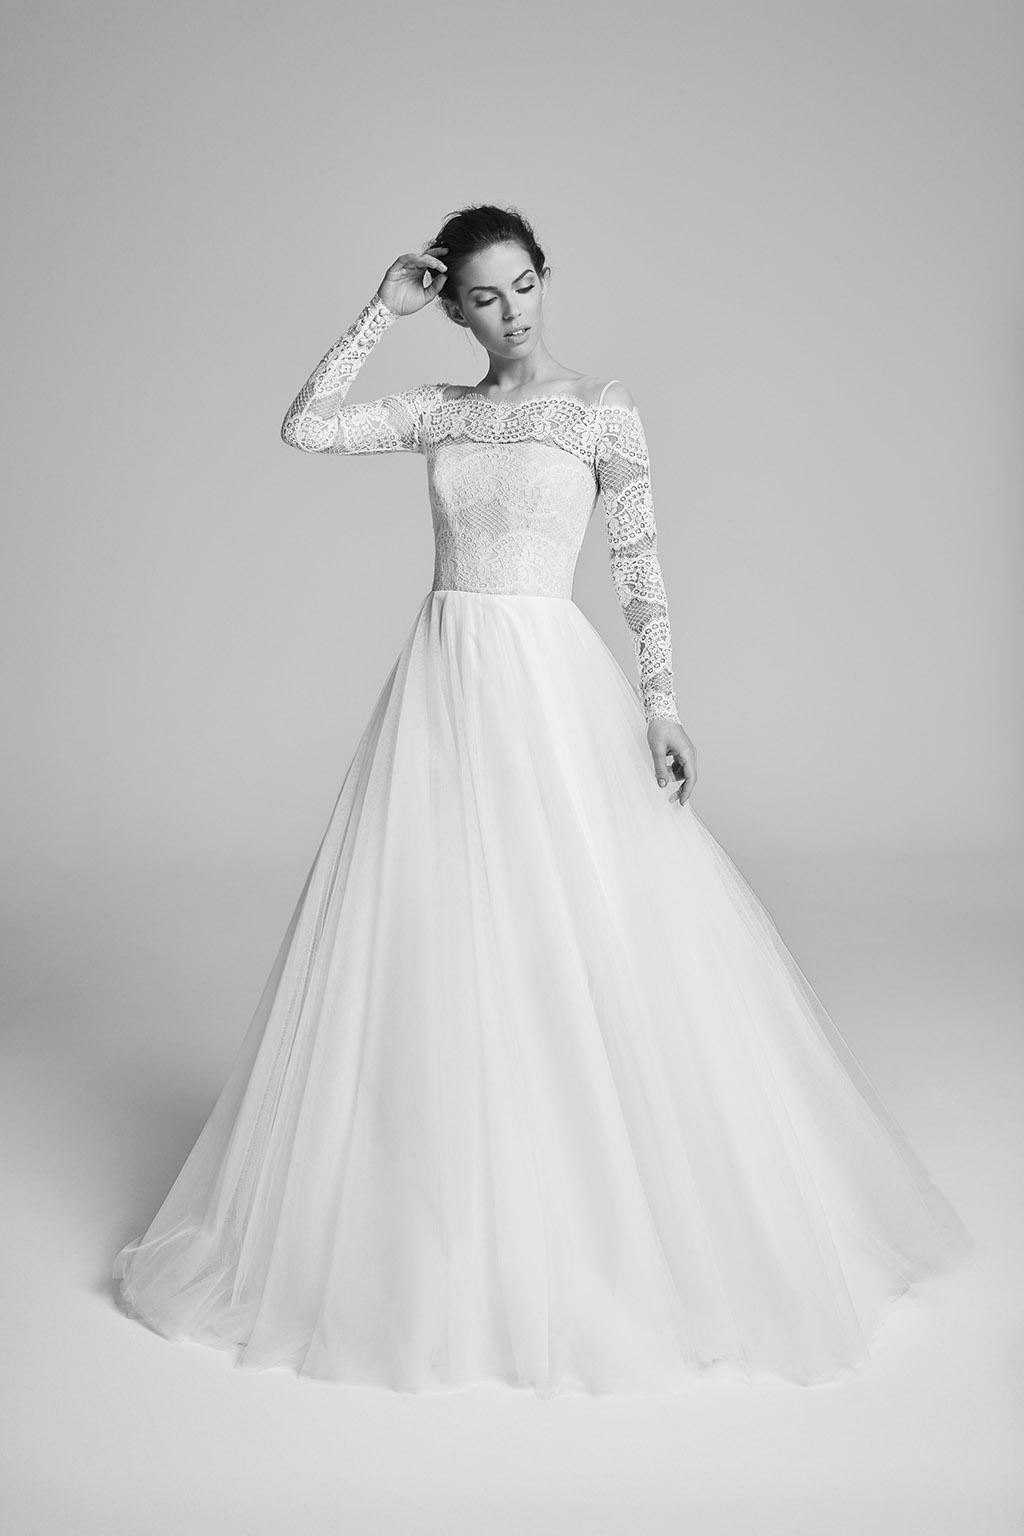 lempika-bridalcouture-wedding-dresses-uk-belle-epoque-collection-2018-by-designer-suzanne-neville